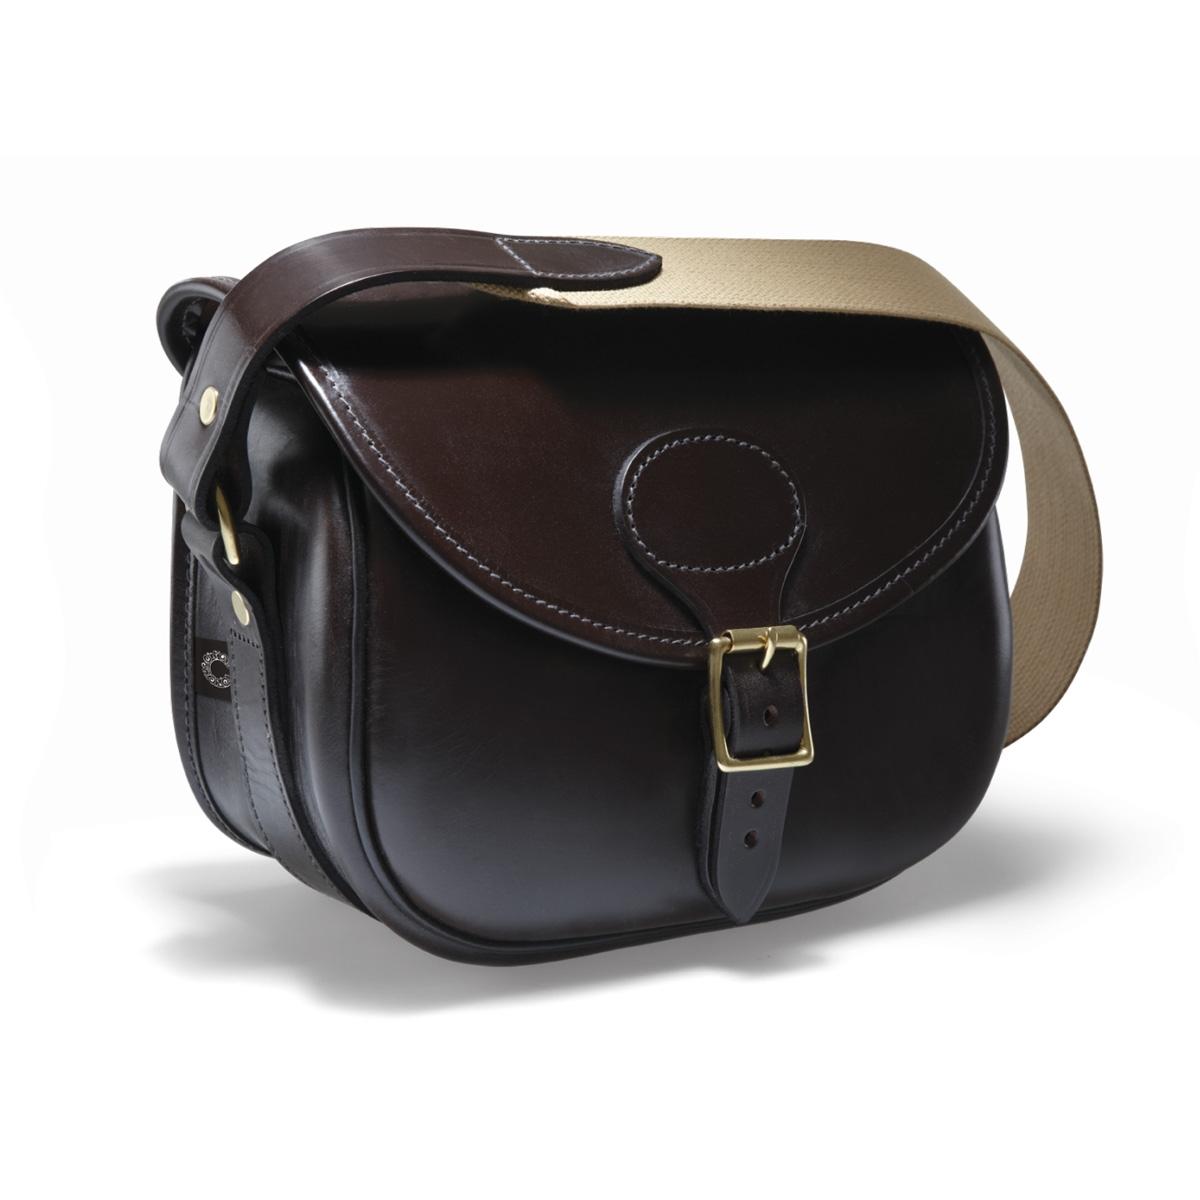 Image of Croots Malton Bridle Leather Cartridge Bag - 100 - Dark Havana